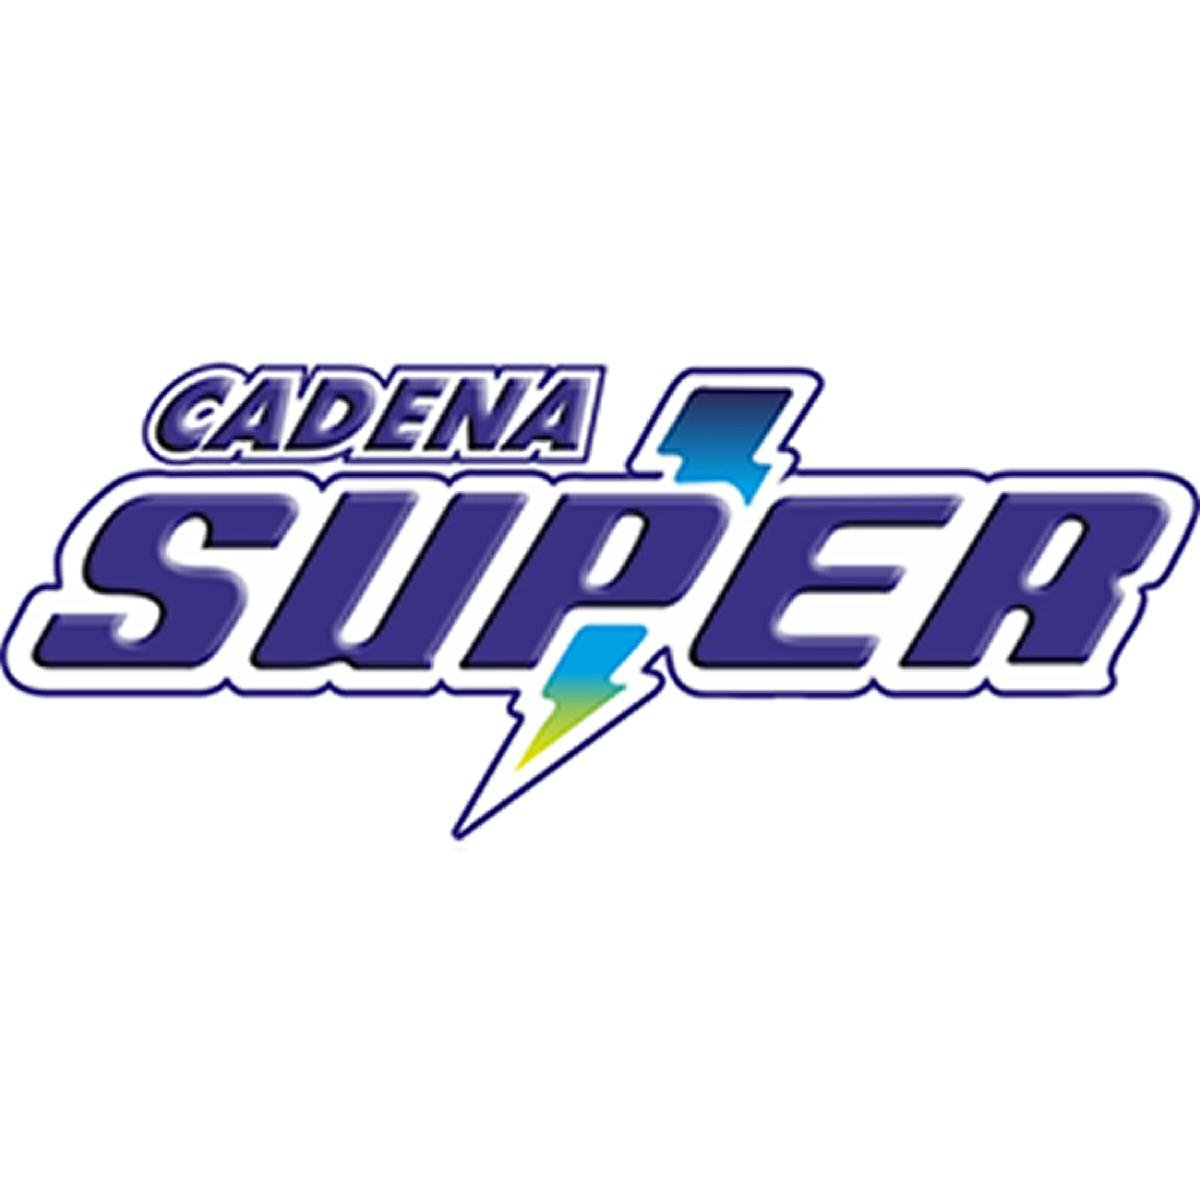 Cadena Super live